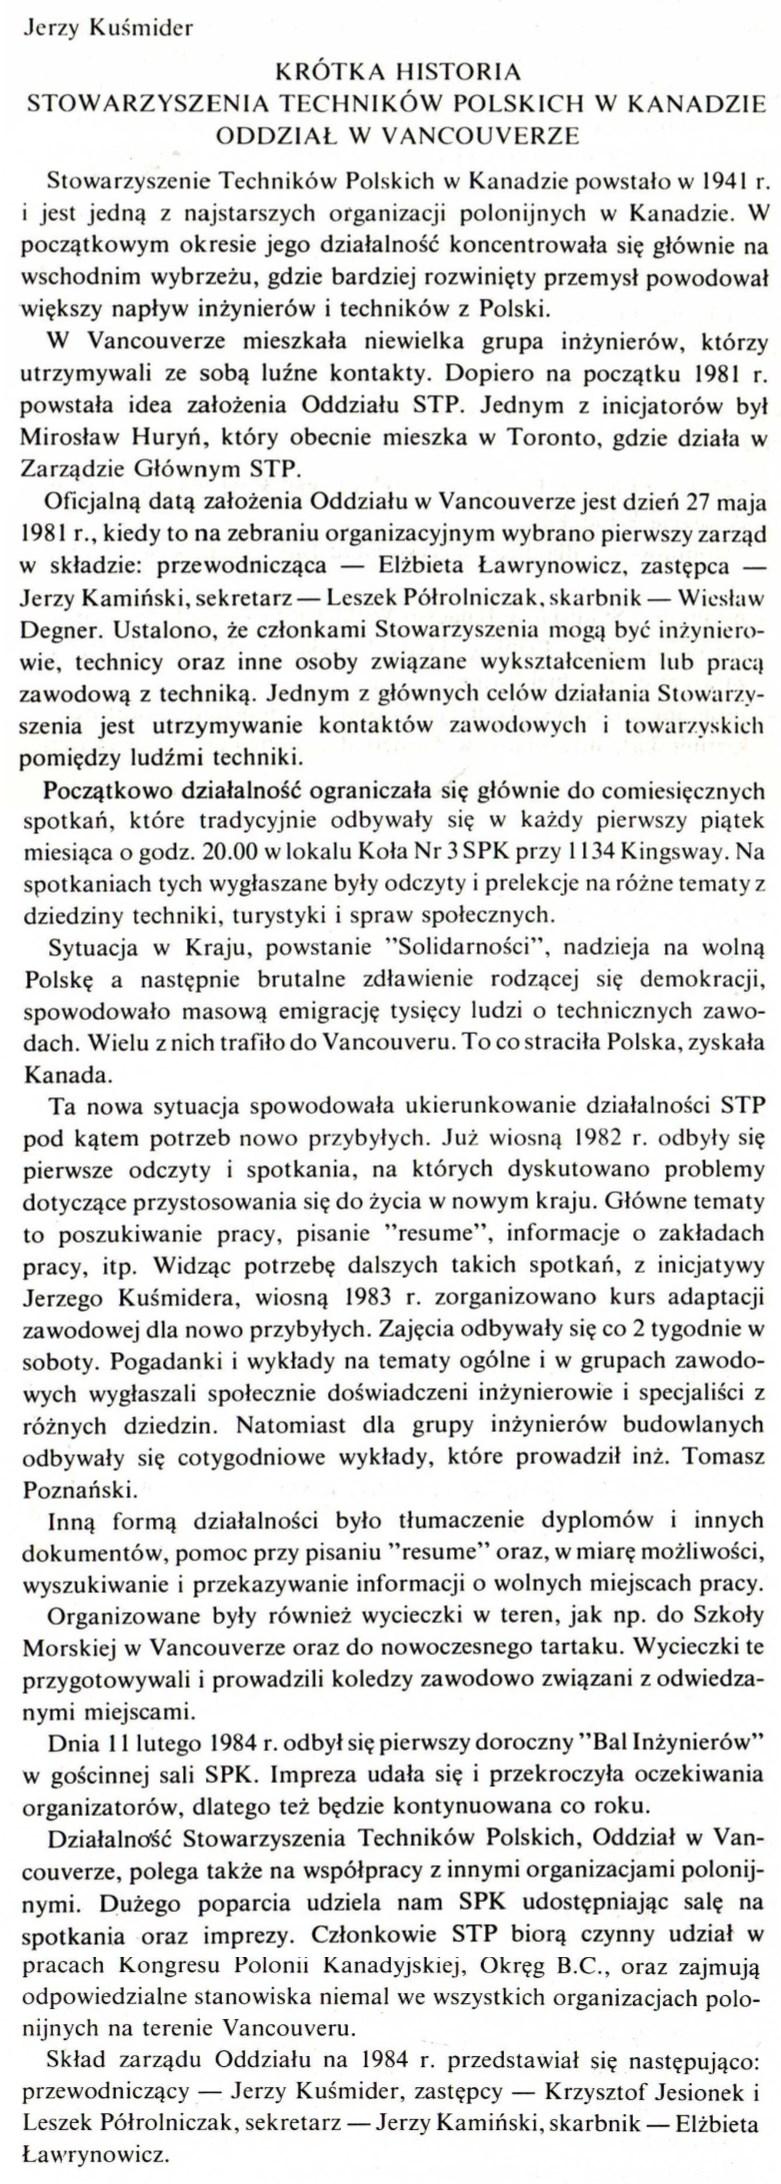 Polacy w BC STP